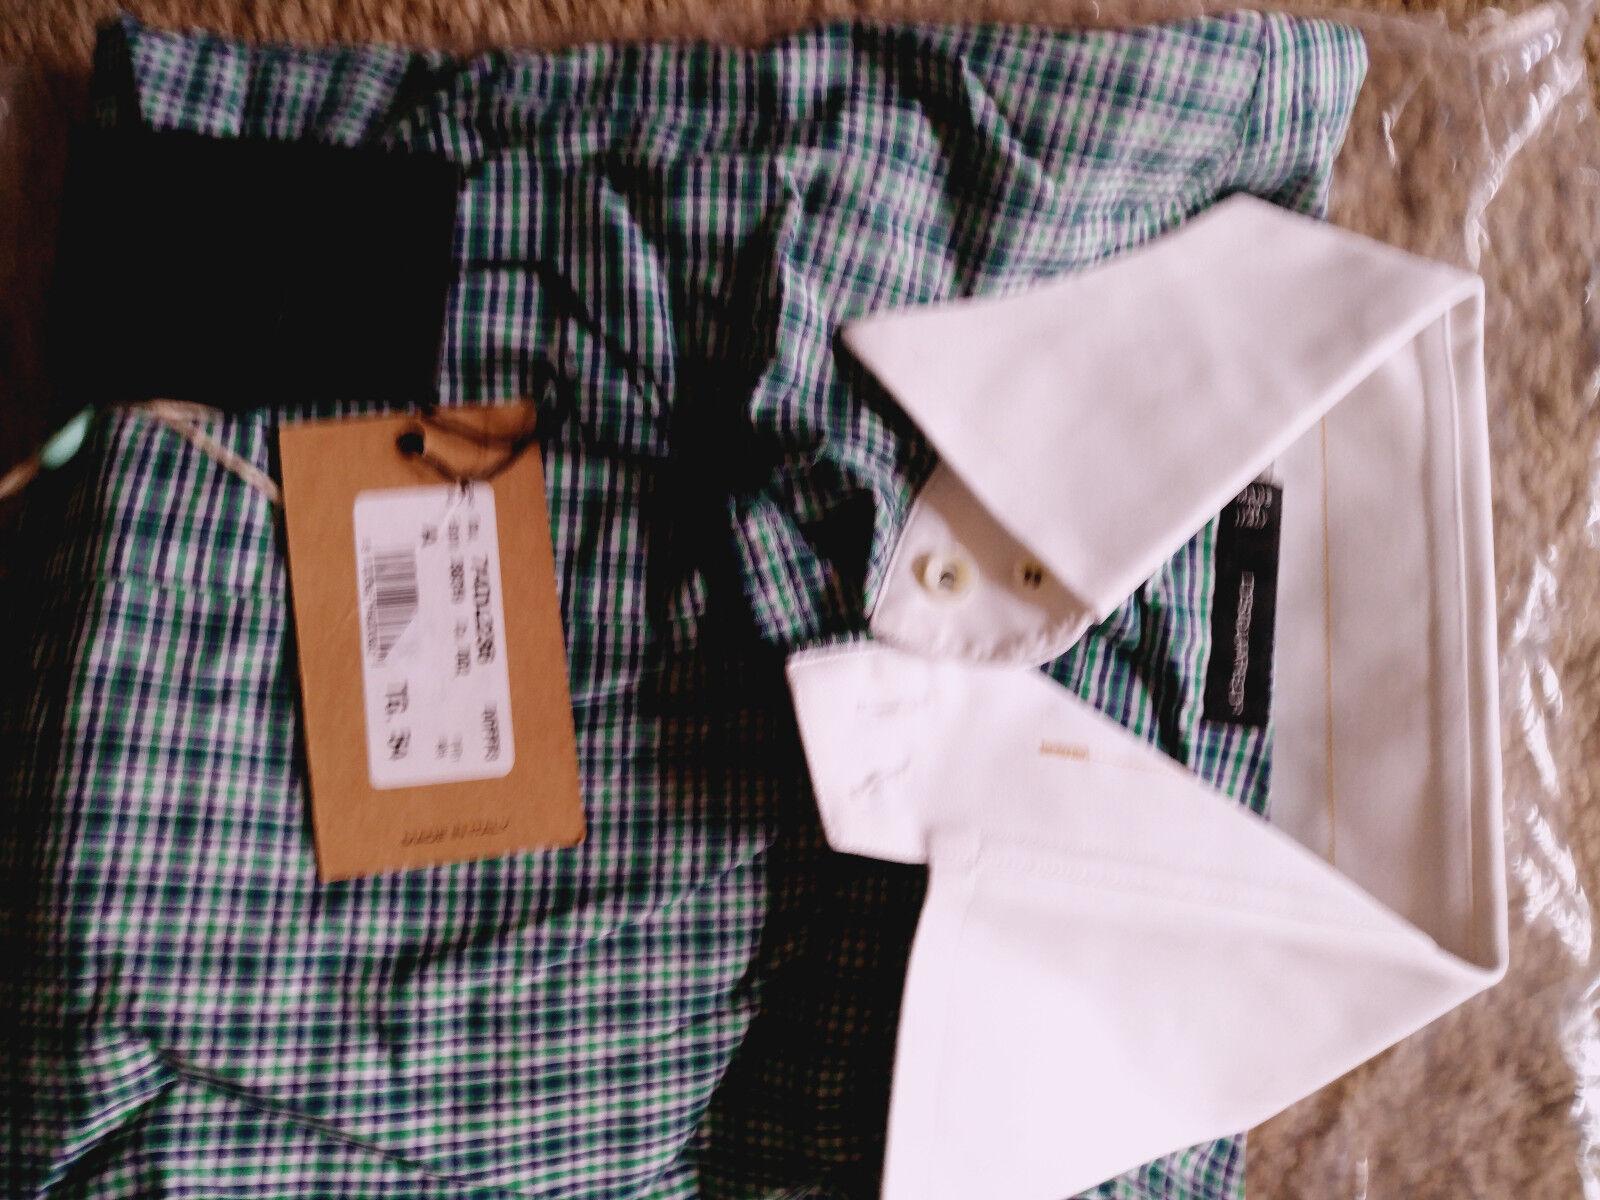 Dsquared2 Men Designer Long Sleeve Shirt -Double Collar, Double Cuff - XL- Rare